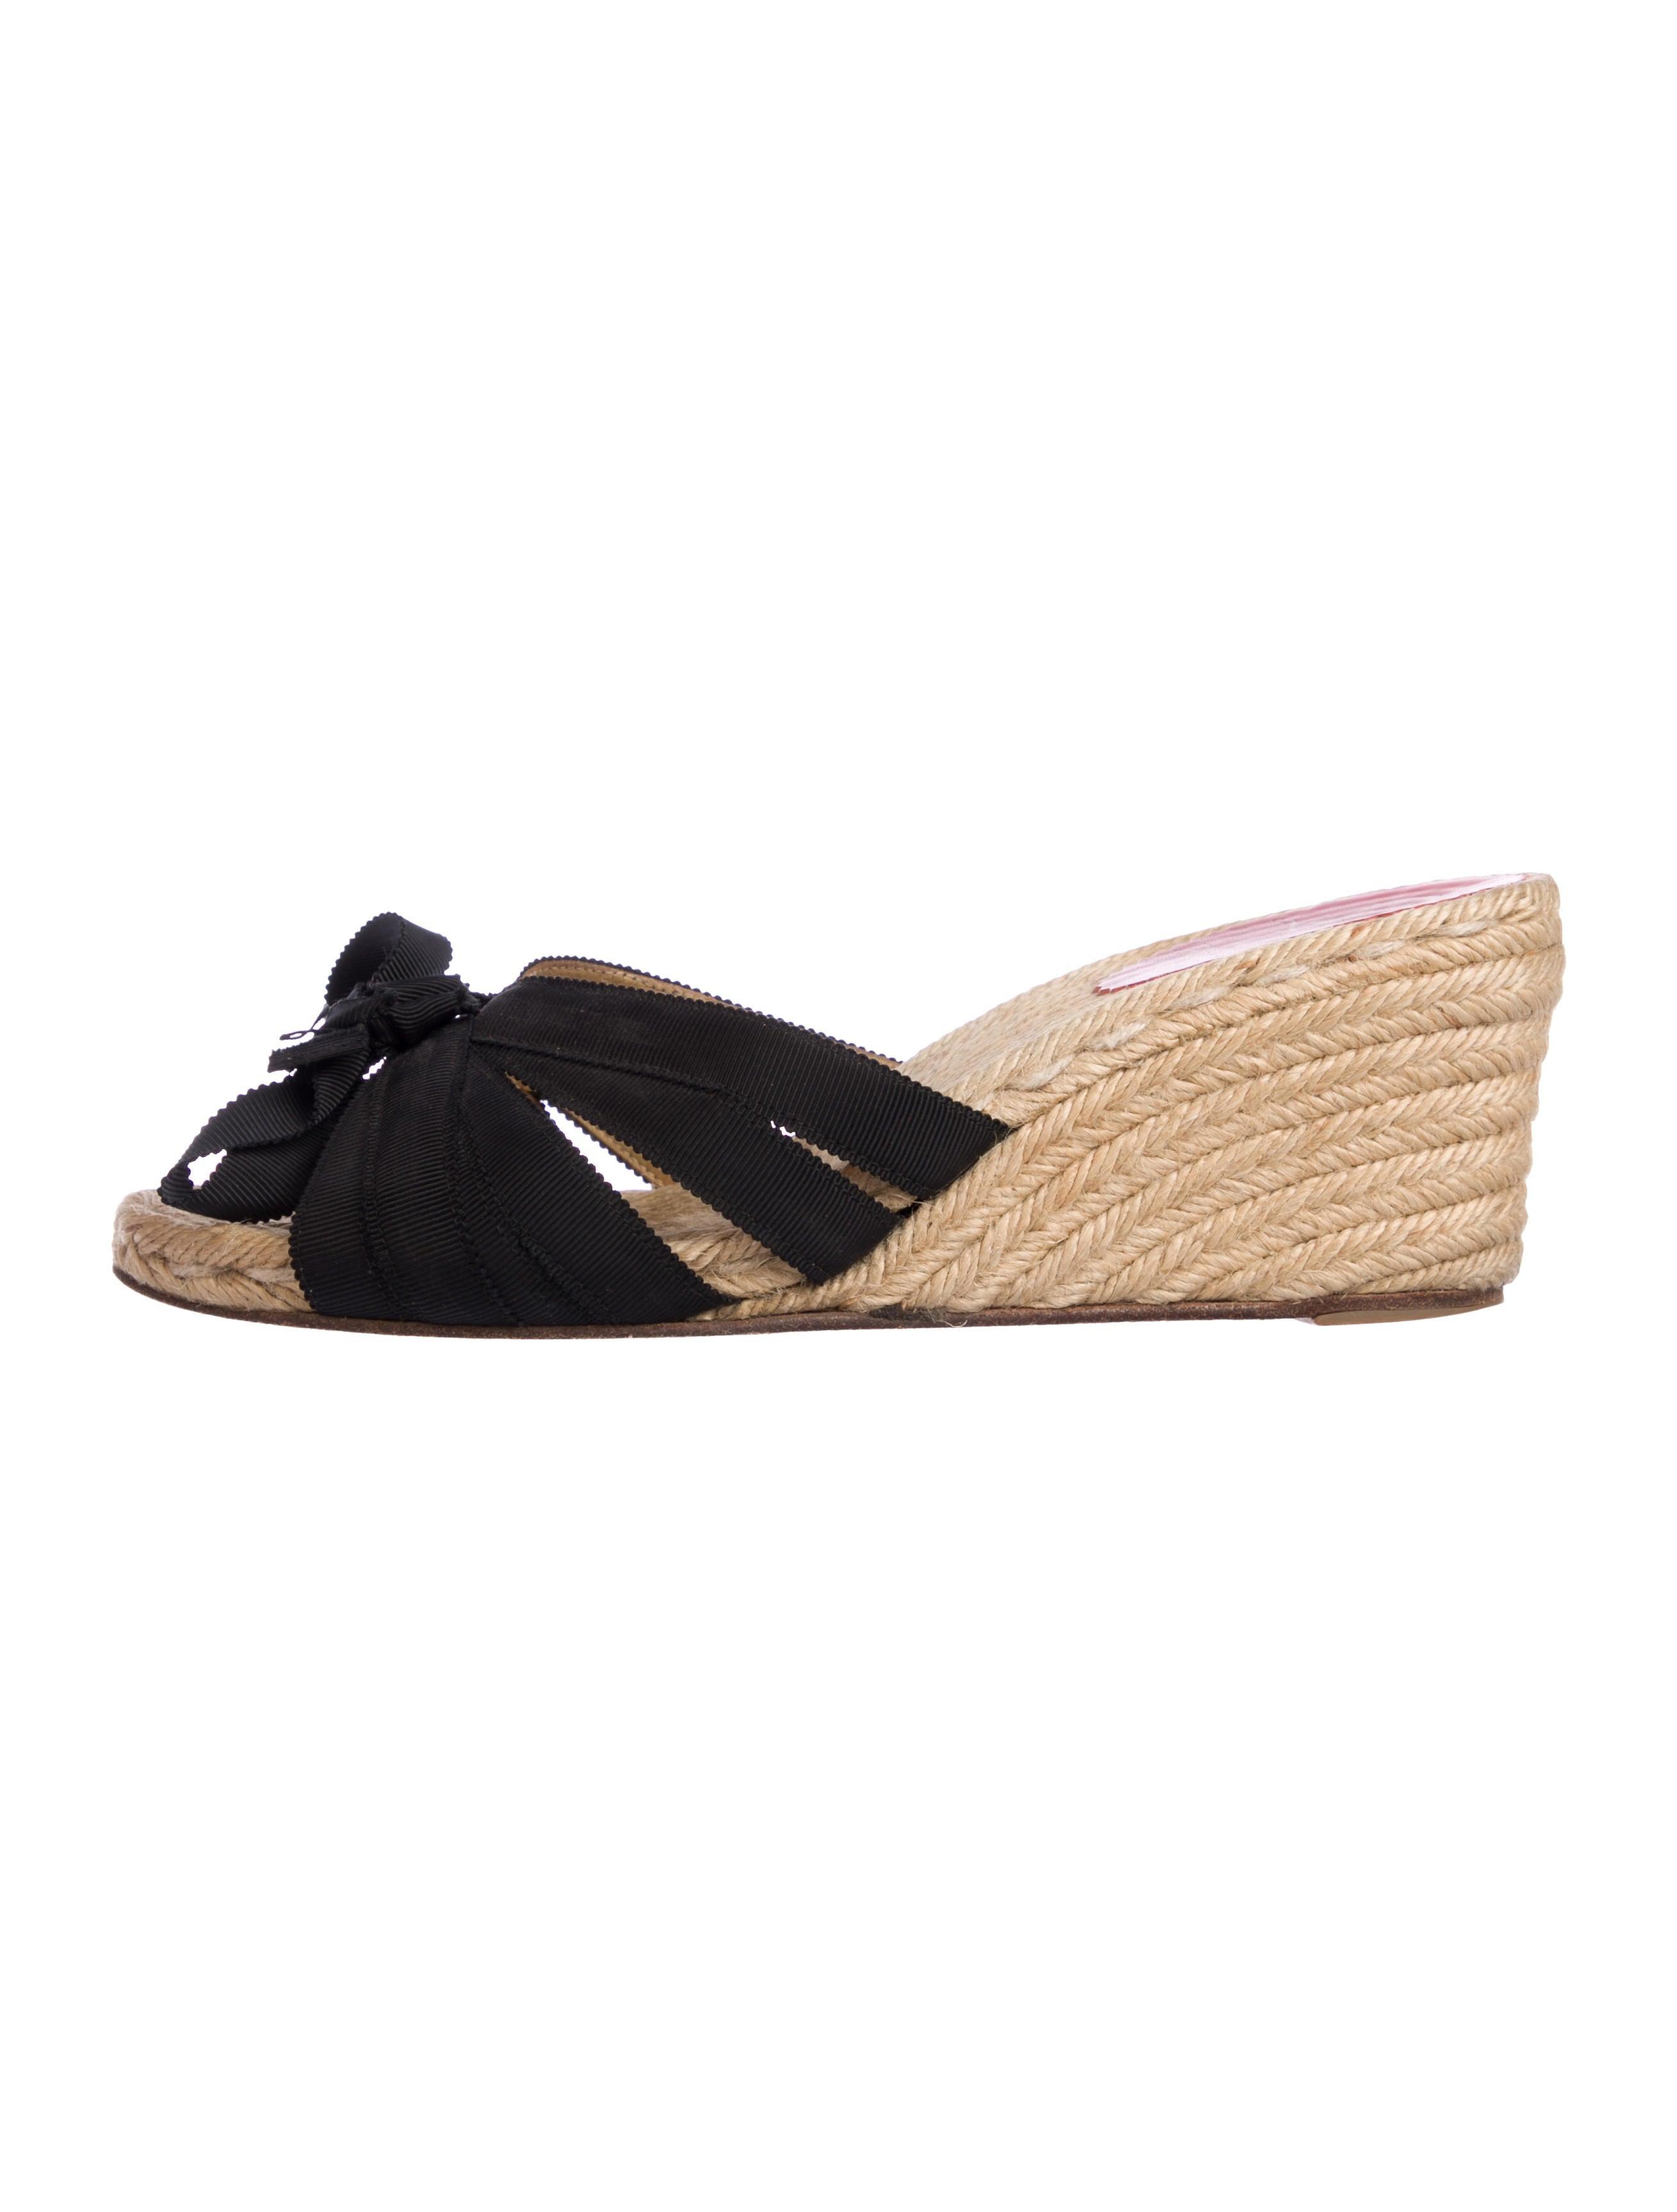 e9f888d117c Christian Louboutin Espadrille Slide Wedges - Shoes - CHT111005 ...